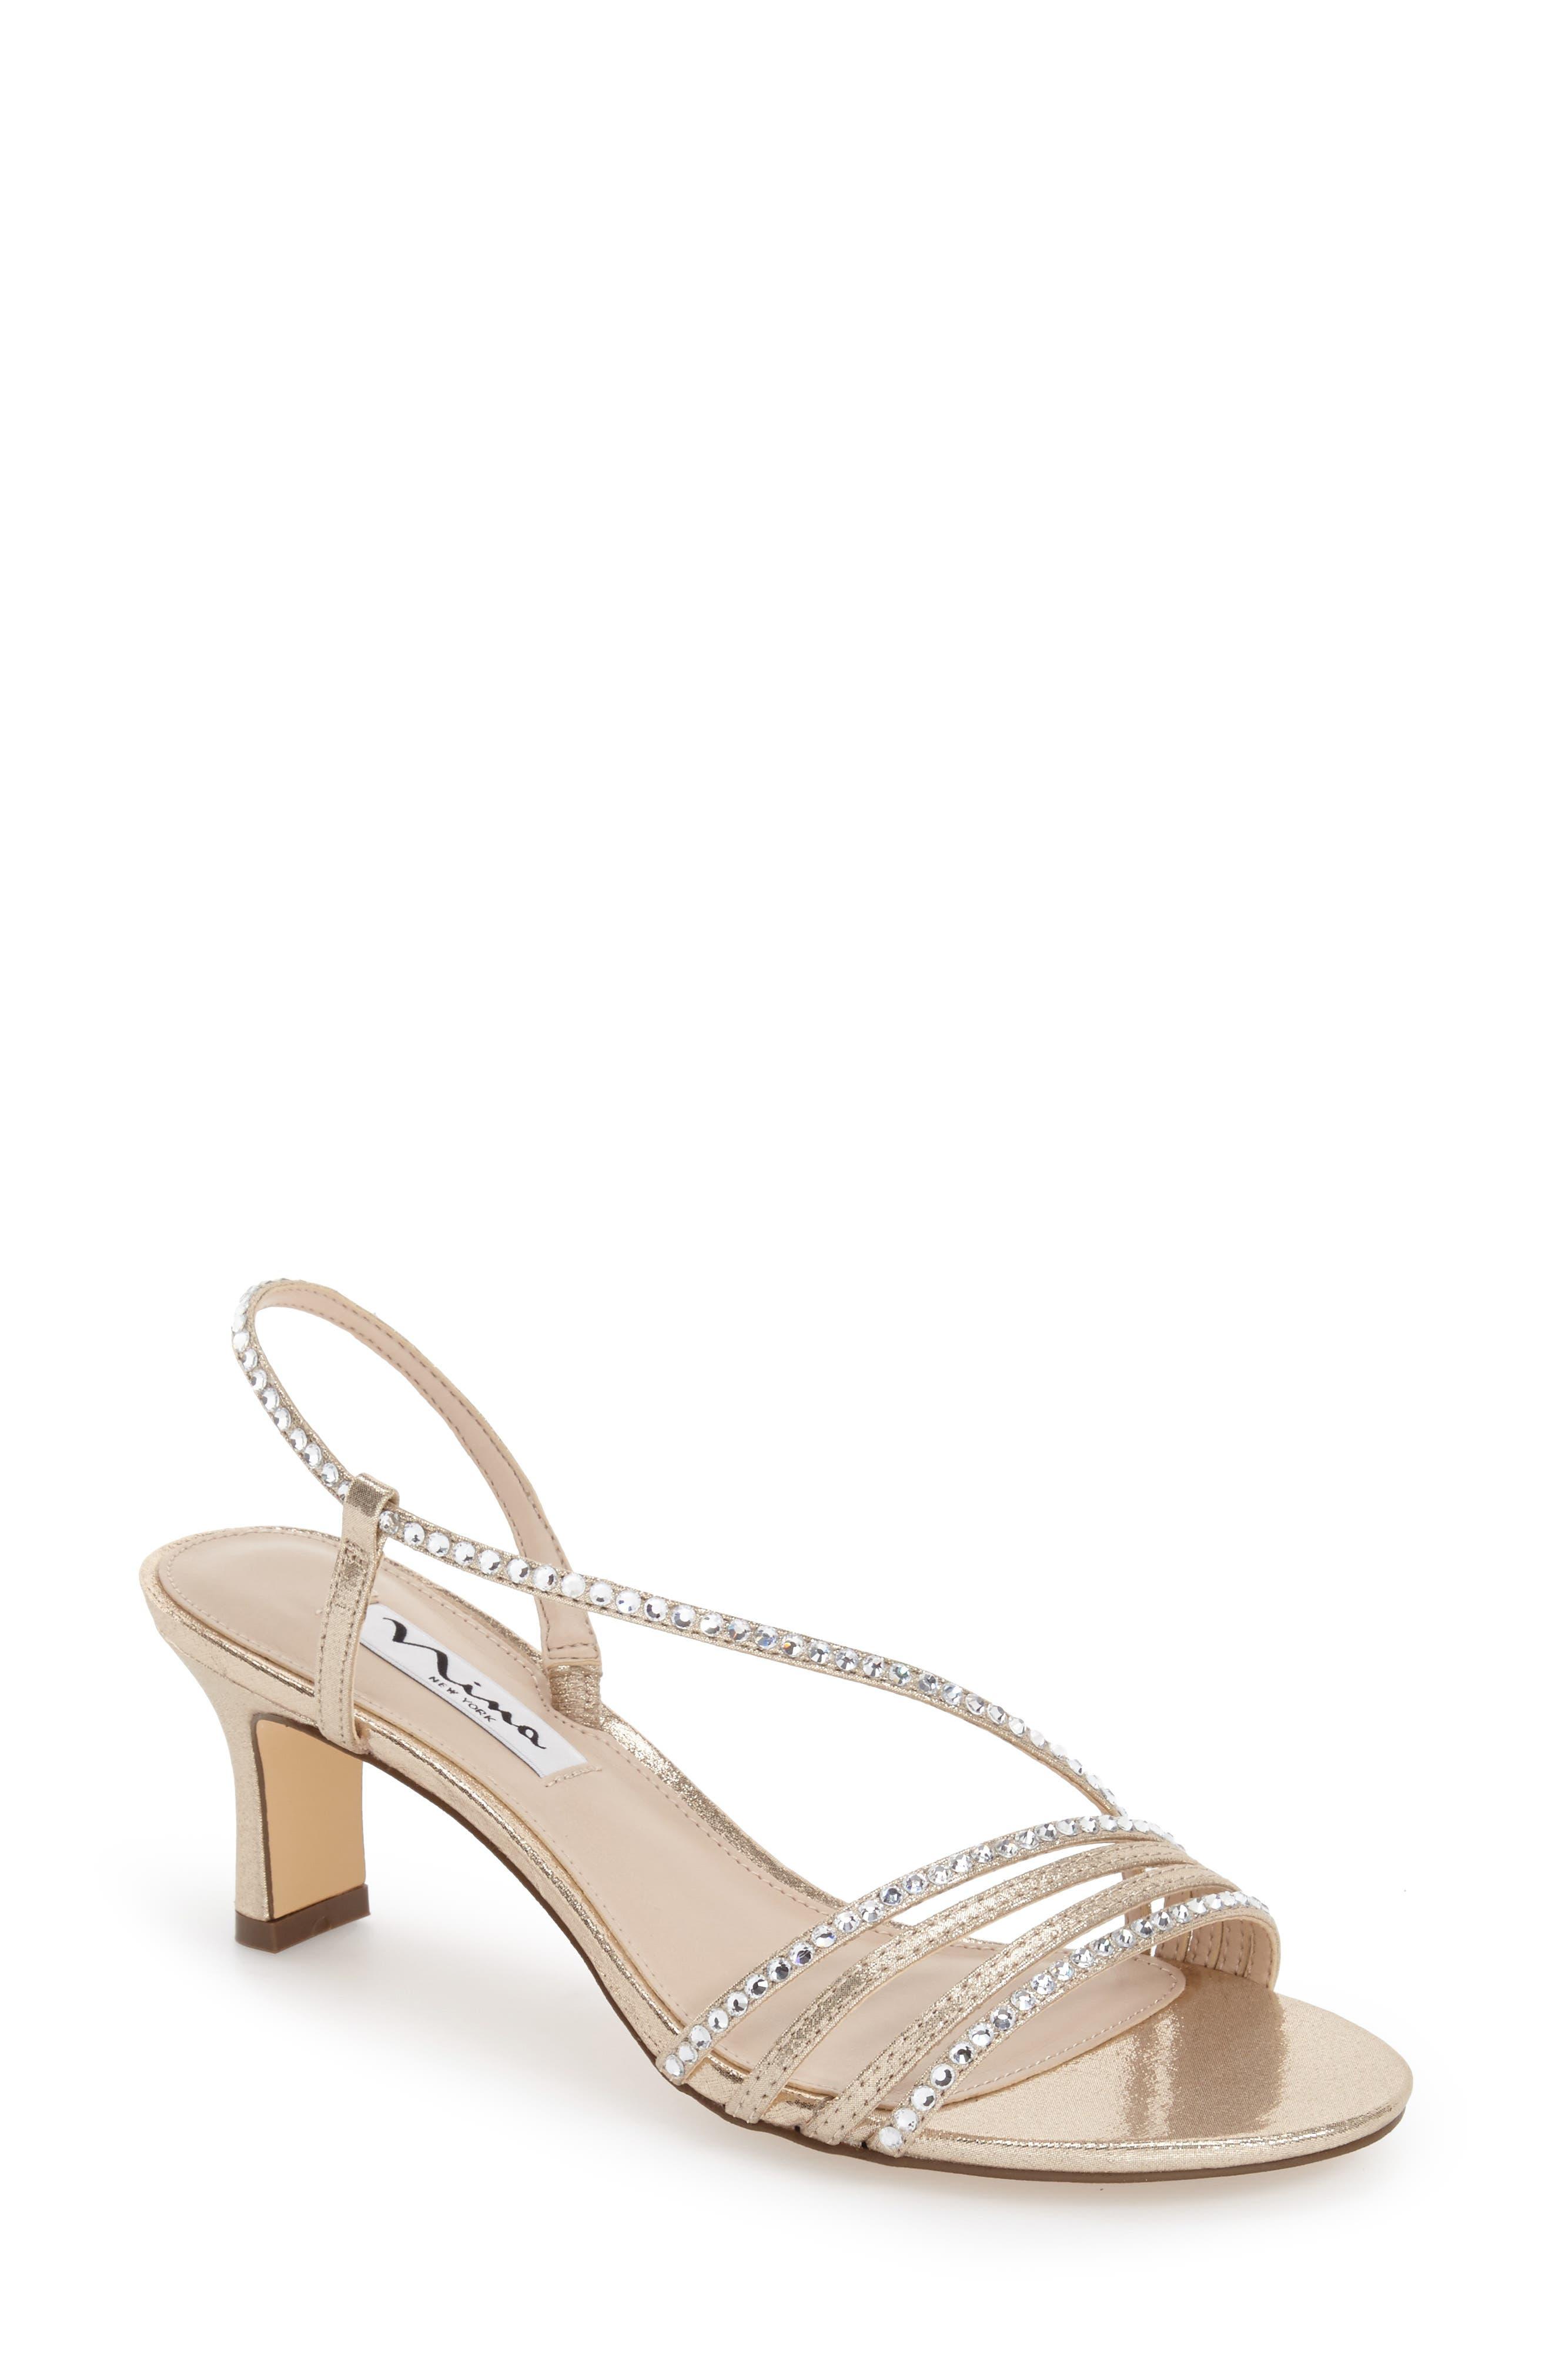 Womens Nina Gerri Embellished Slingback Sandal, Size 8 M - Blue